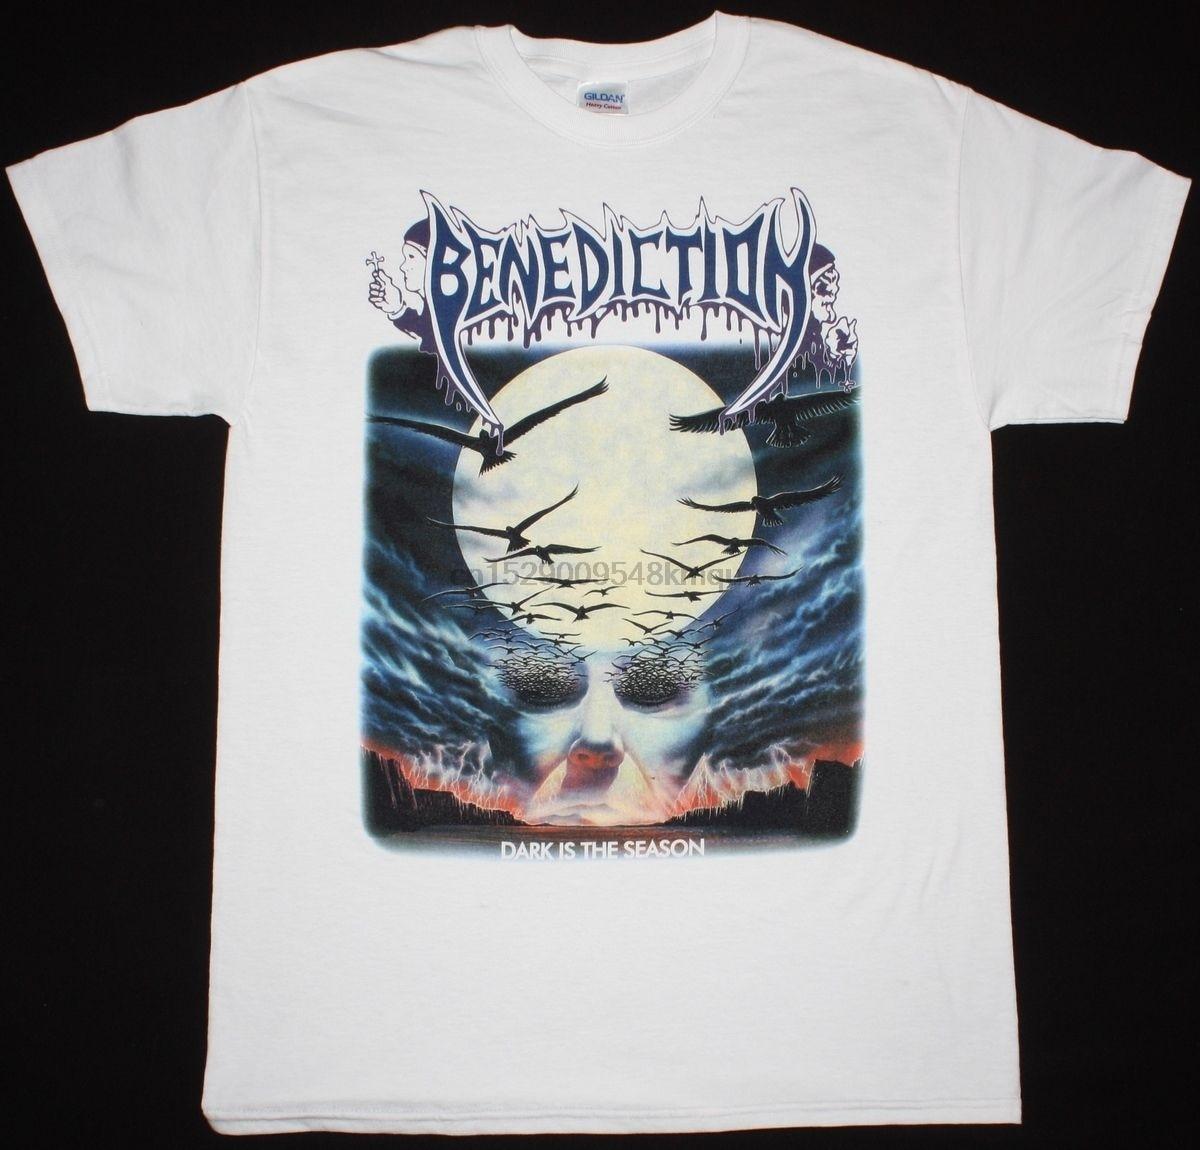 BENEDICTION DARK IS THE SEASON DISMEMBER NAPALM DEATH S-XXL NEW WHITE T-SHIRT 2019 fashion t shirt   100% cotton tee shirt